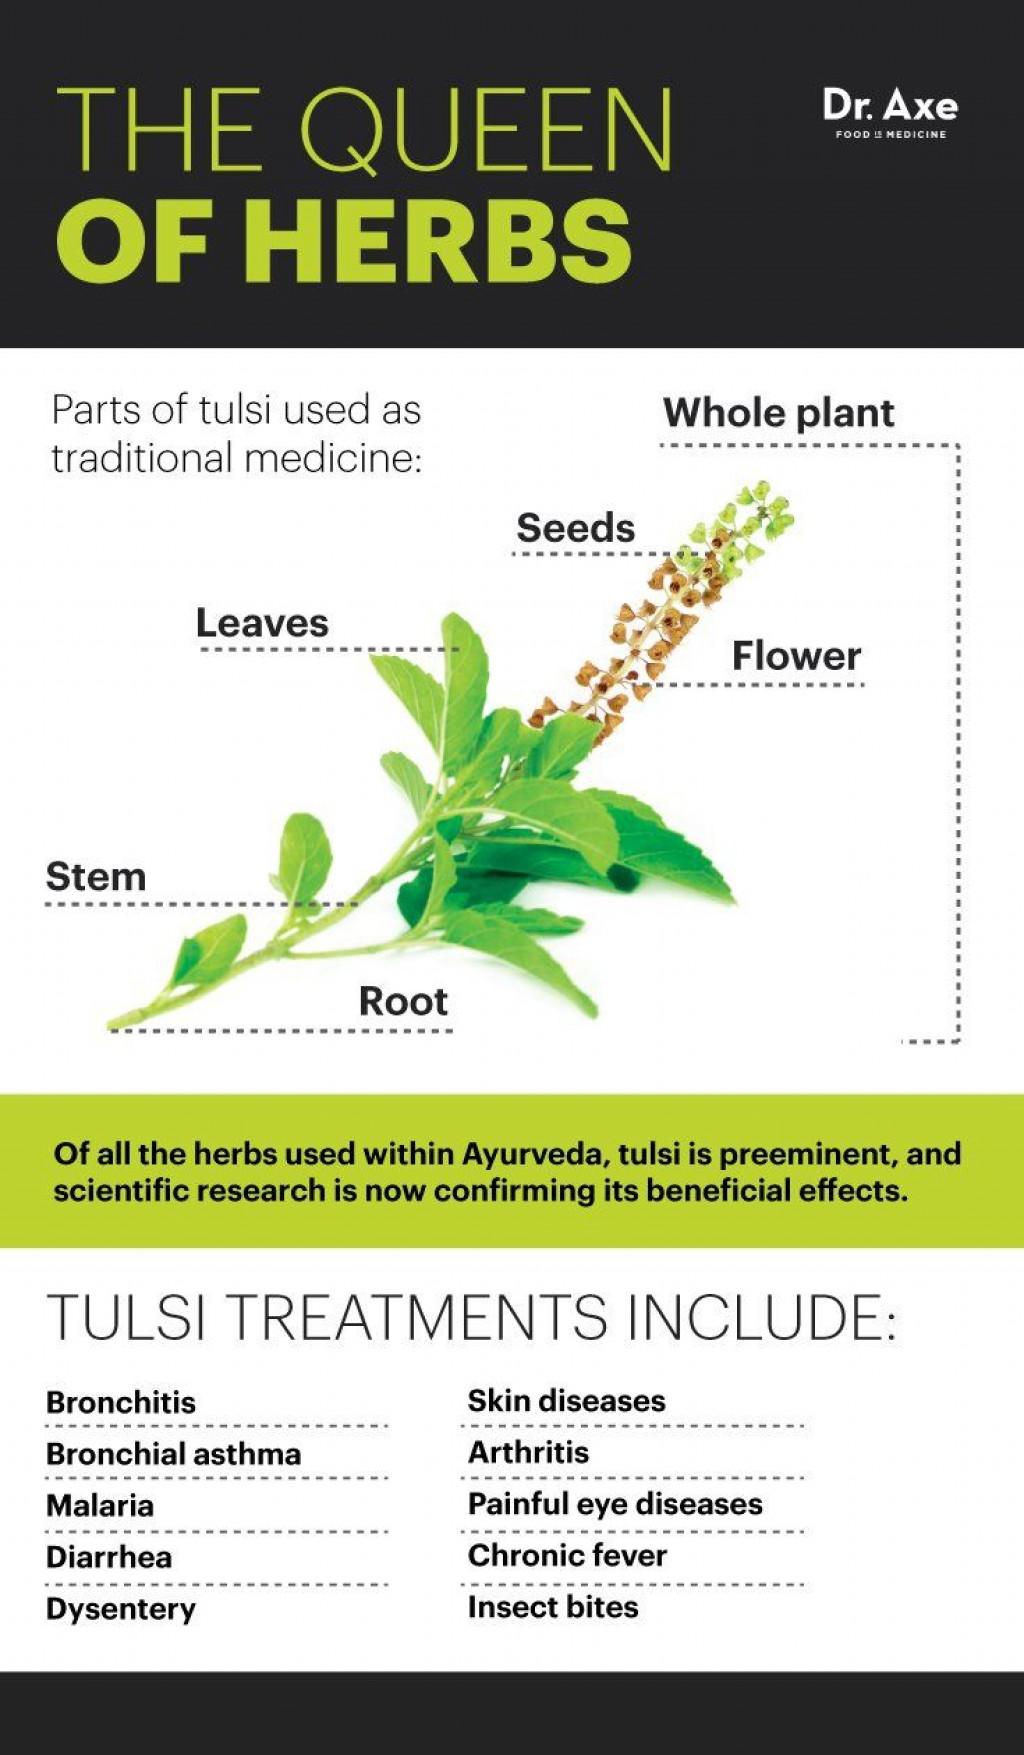 013 Essay Example On Tulsi Plant Archaicawful In Hindi Marathi Kannada Large